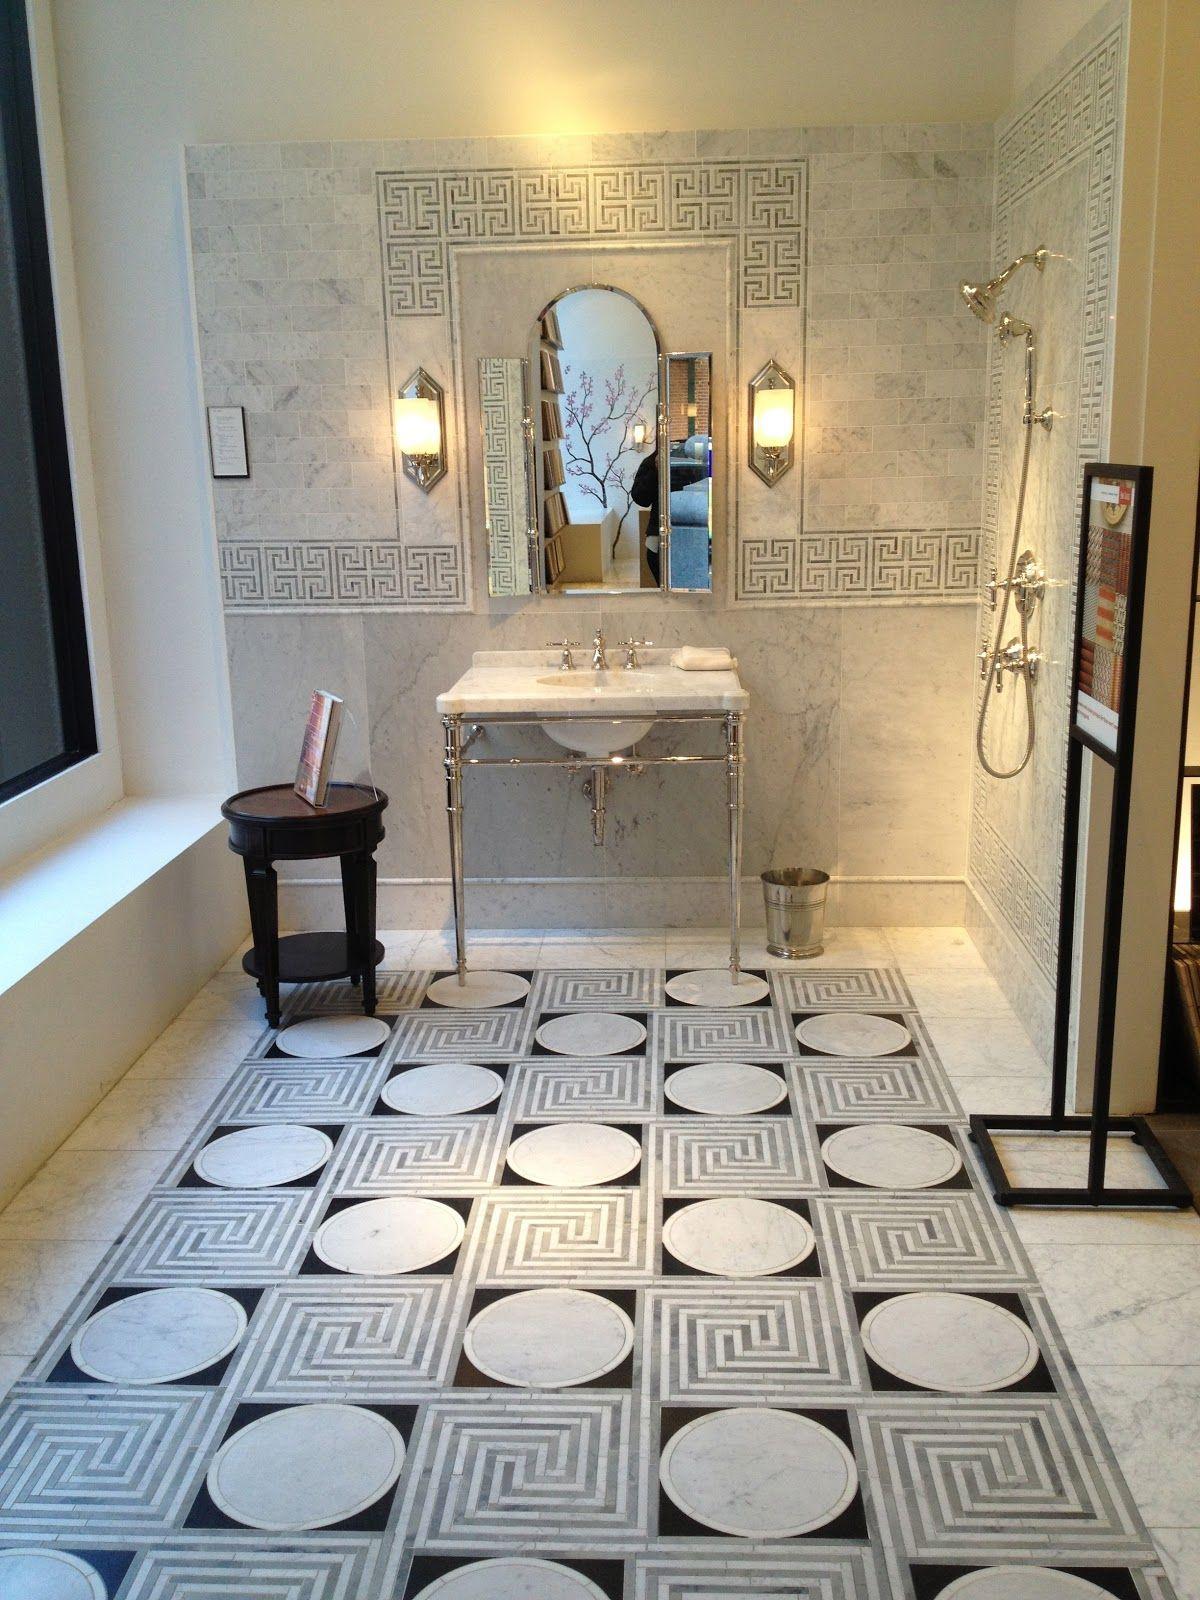 Ann Sacks Ann Sacks Nyc Showroom To Say That I Was In Tile Heaven Is The Ann Sacks Tiles